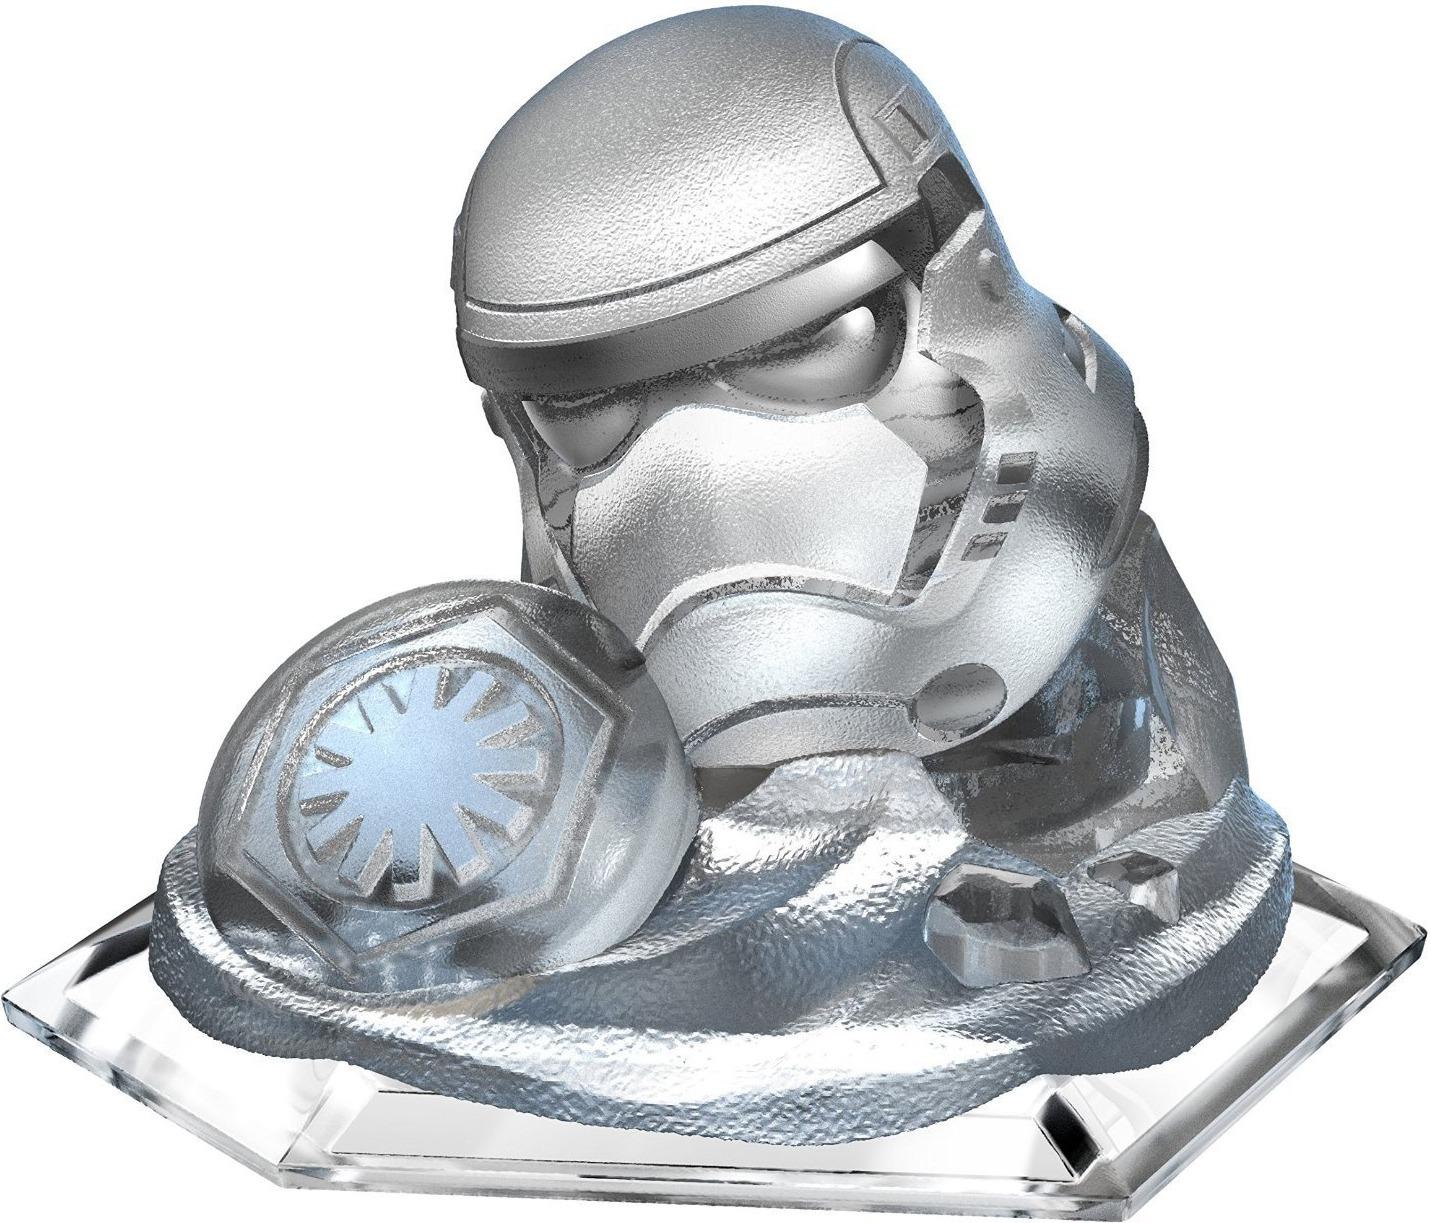 Force Awakens Play Set Crystal